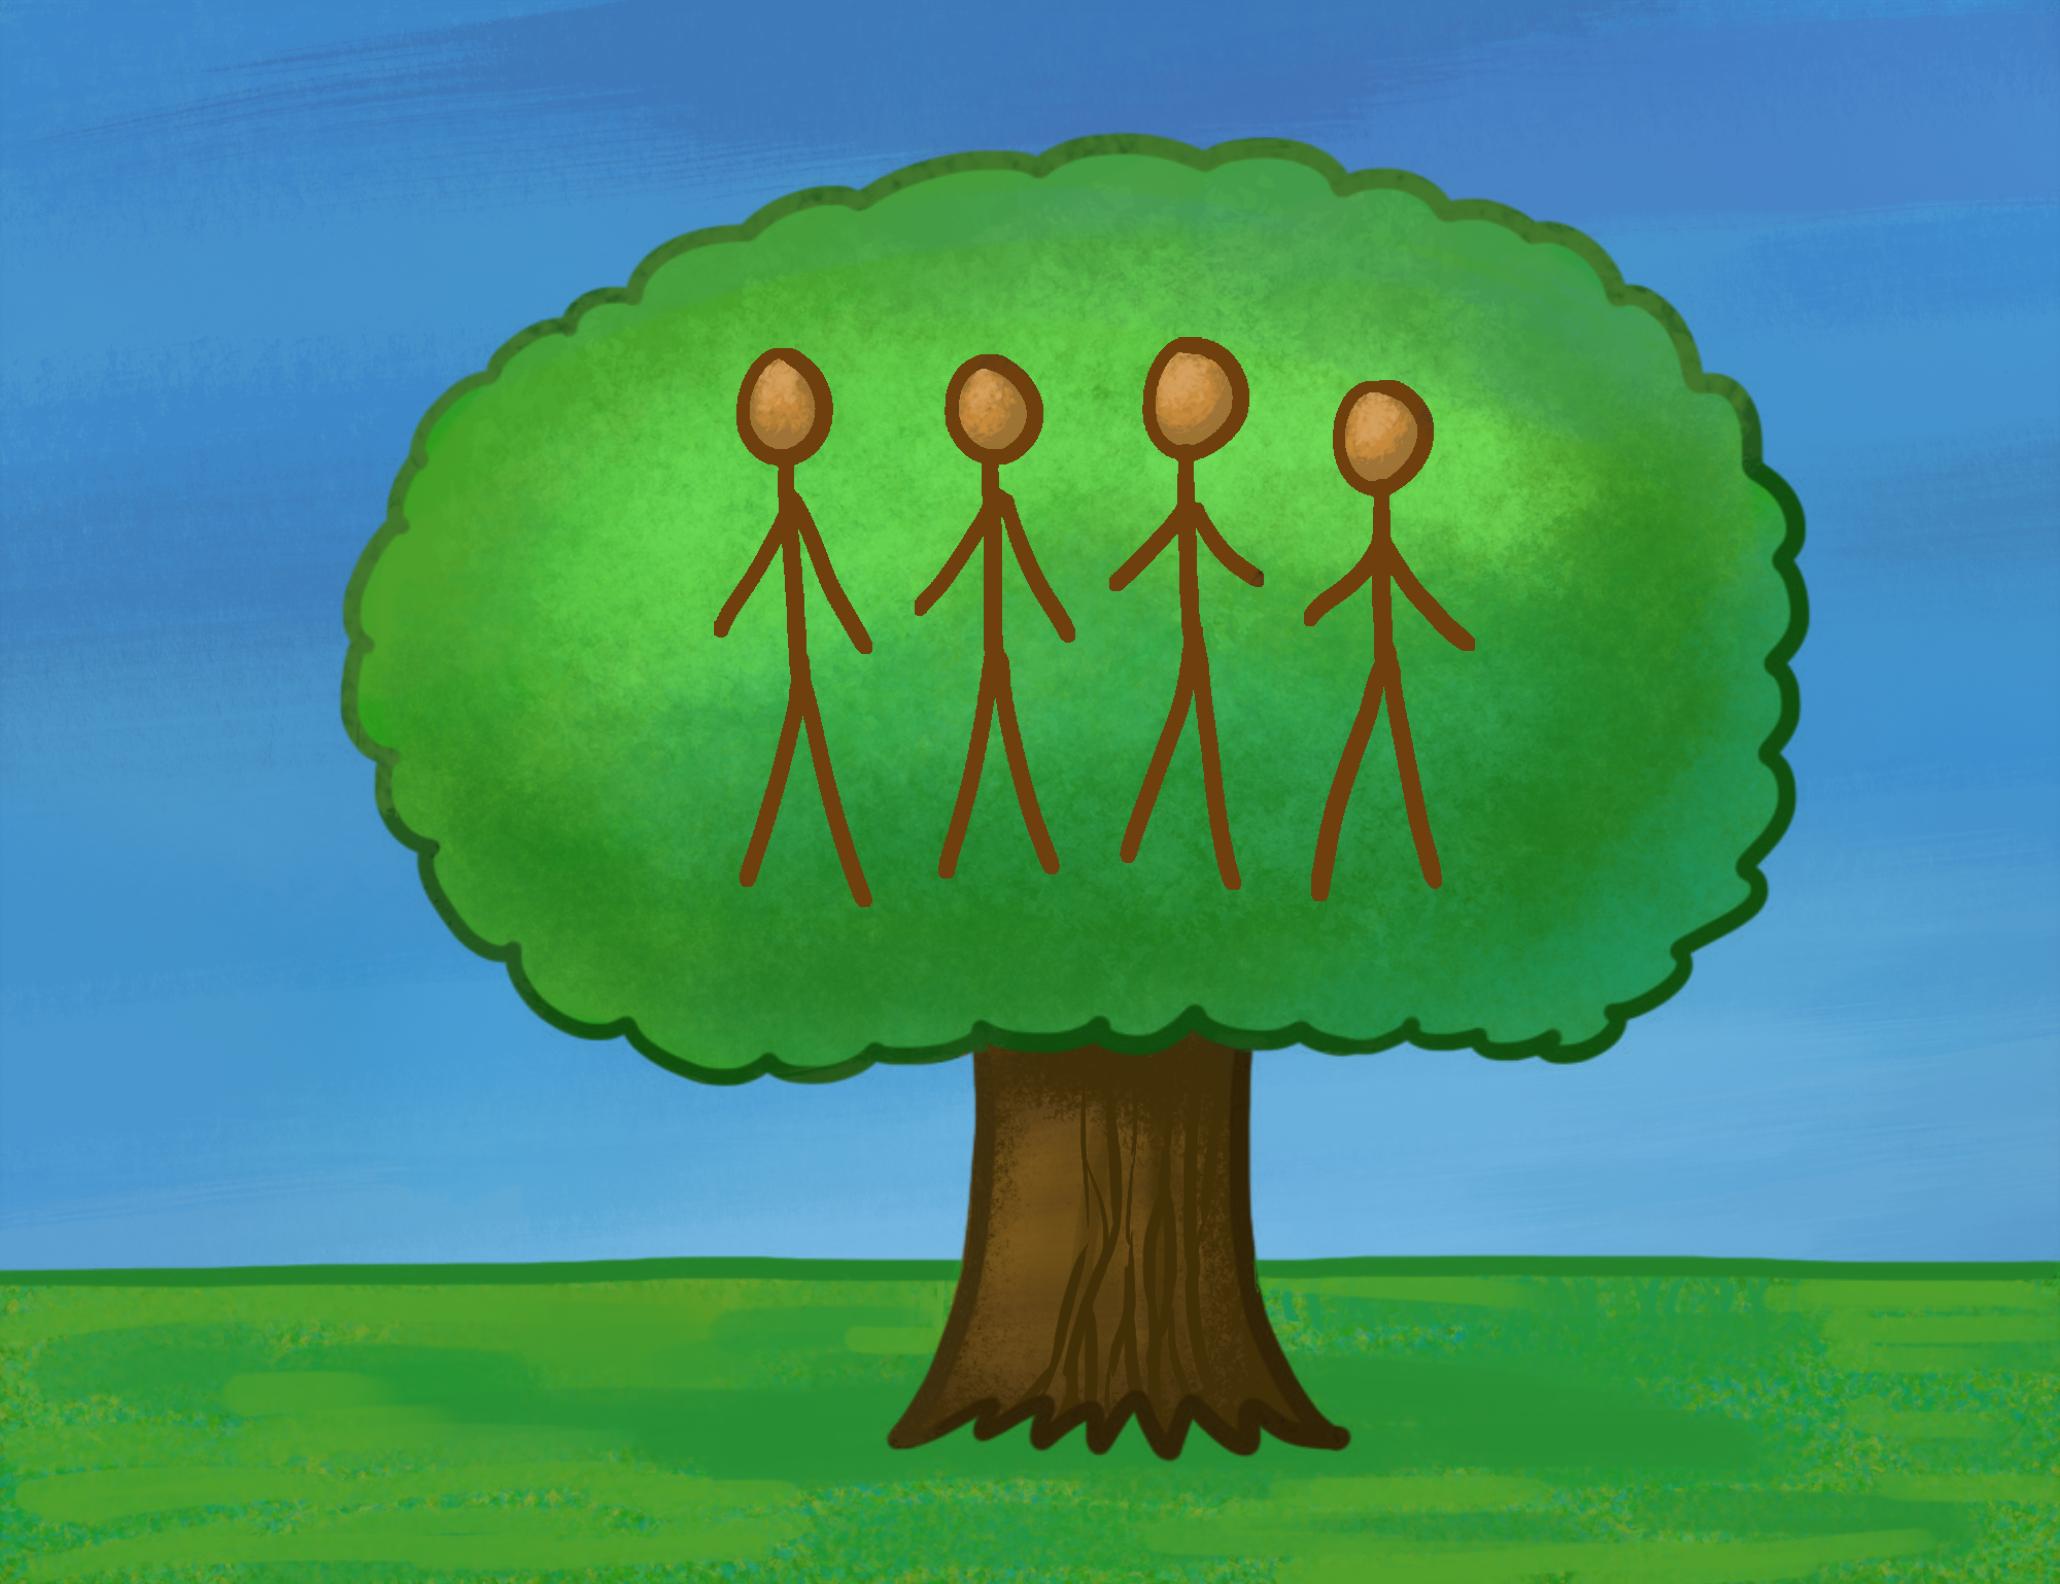 Storyboard 3: Chosen People